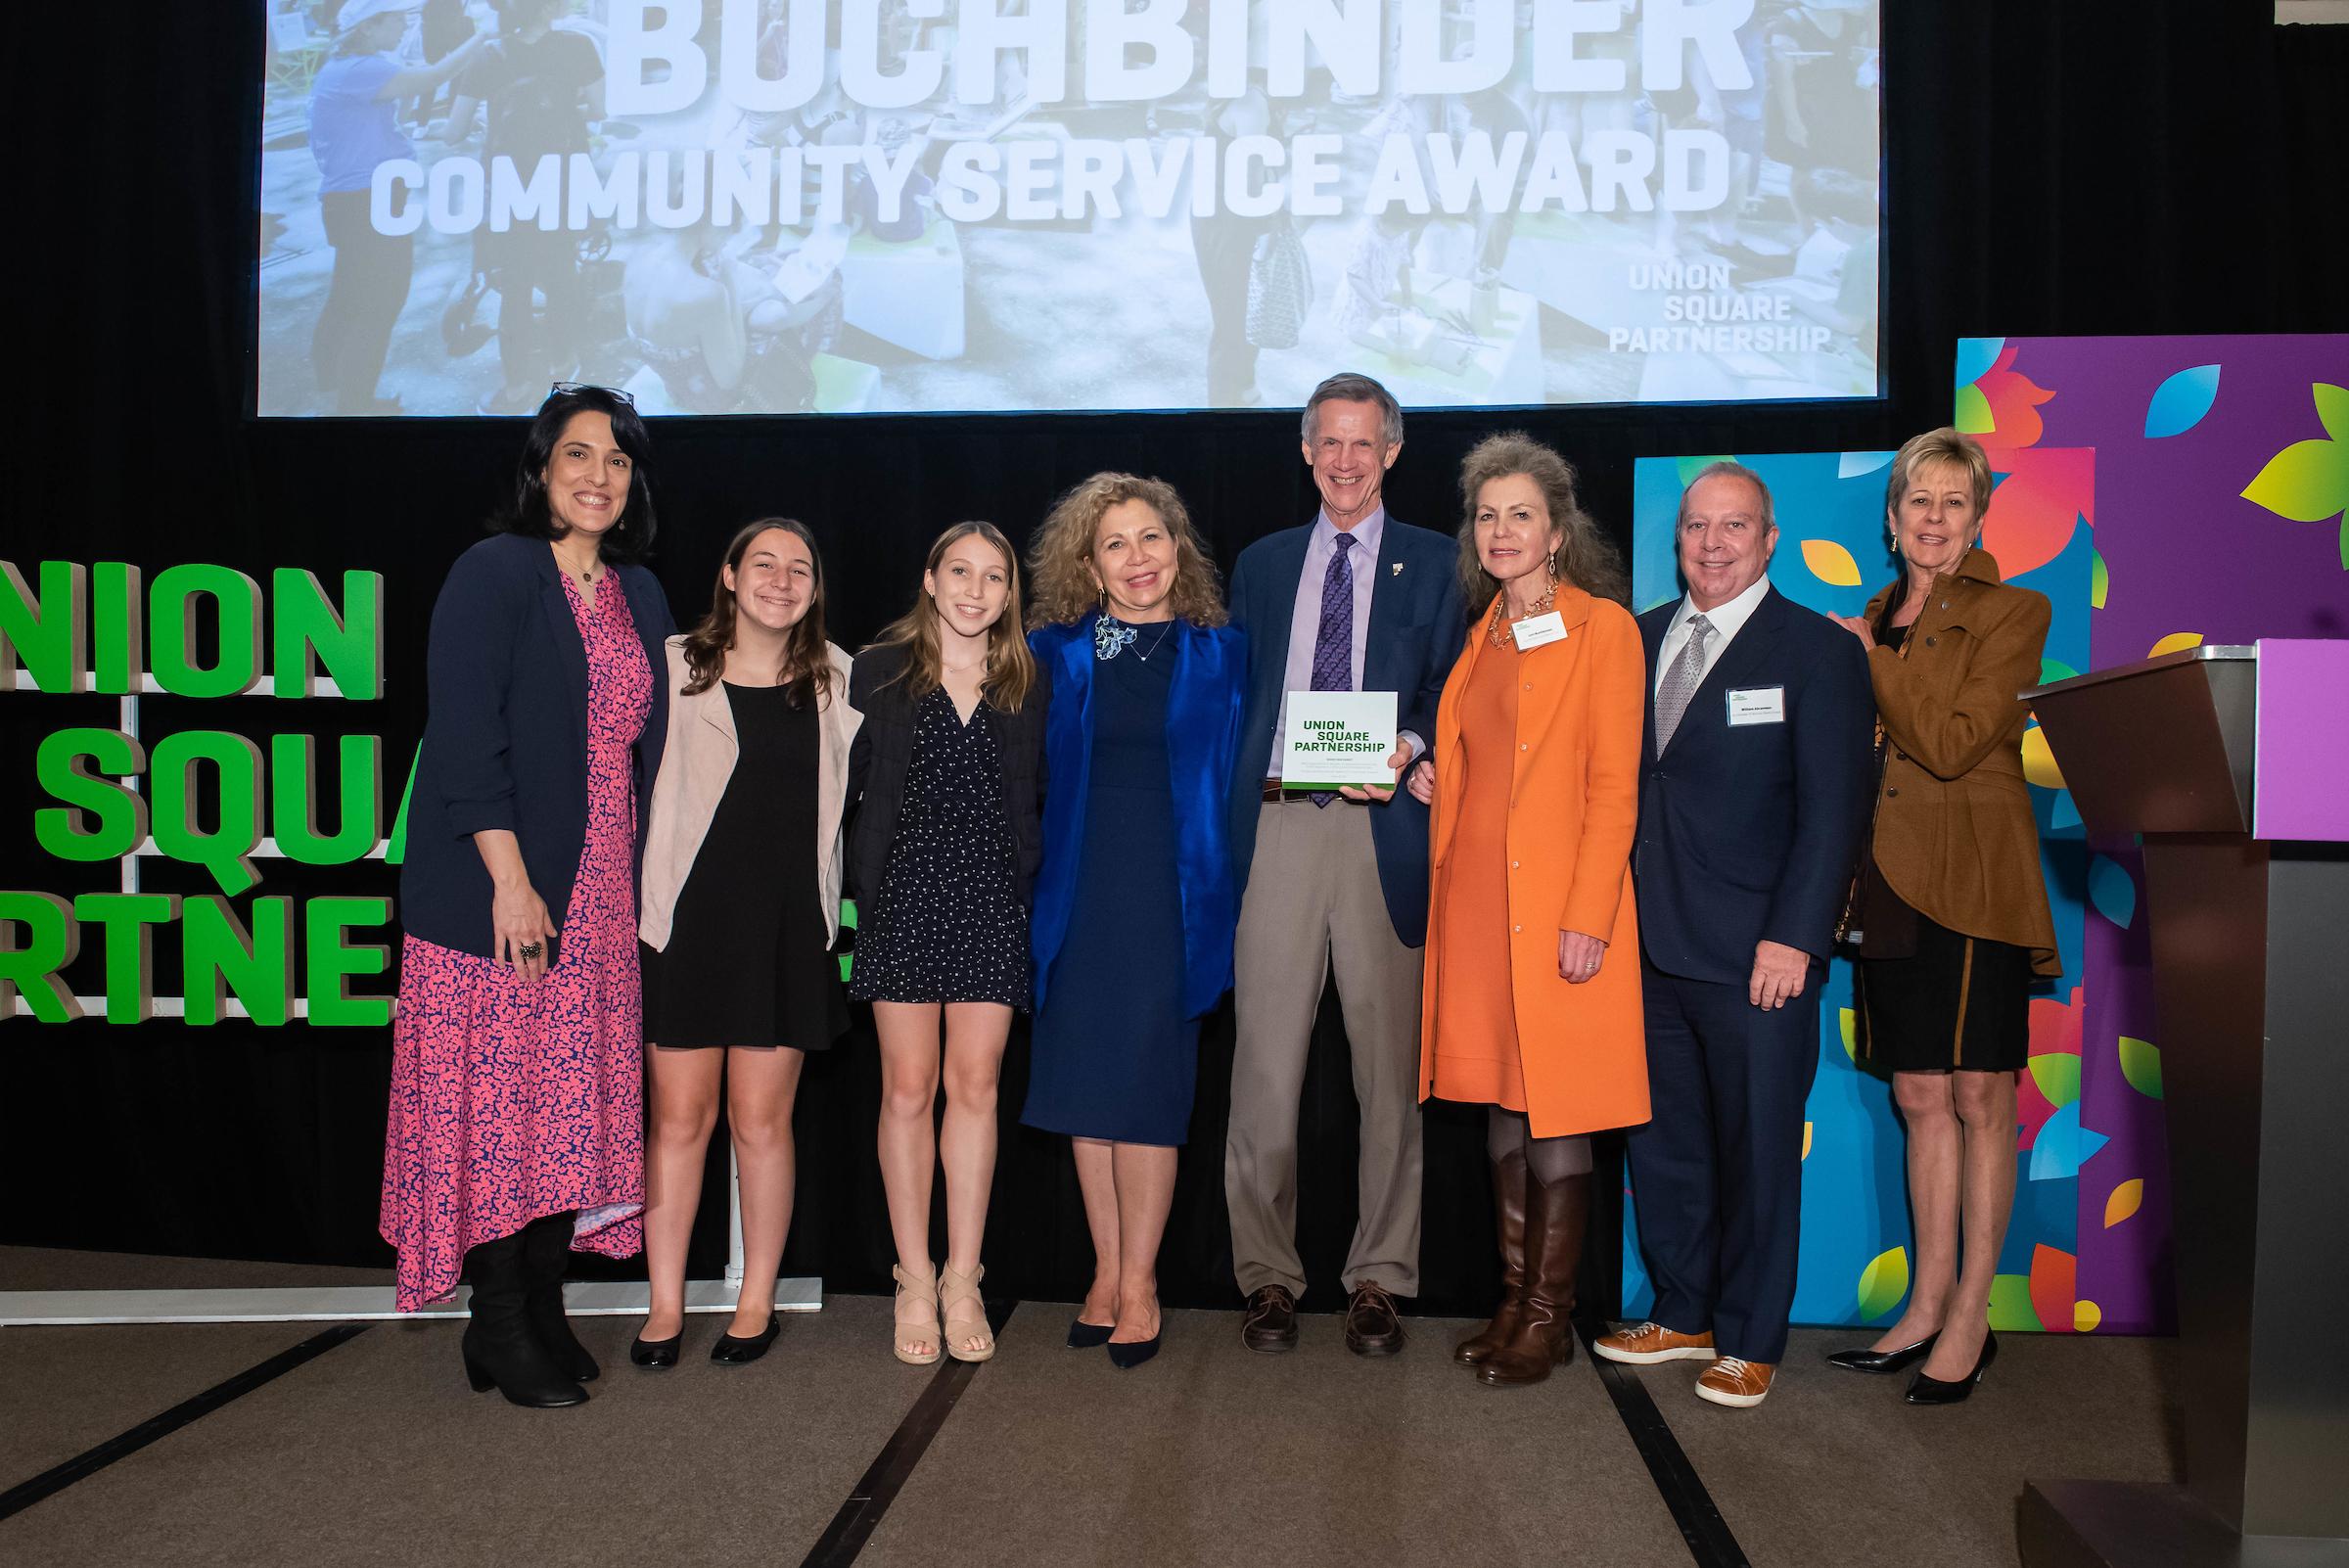 The Buchbinder family presents President Van Zandt with the 2019 Norman Buchbinder Community Service Award